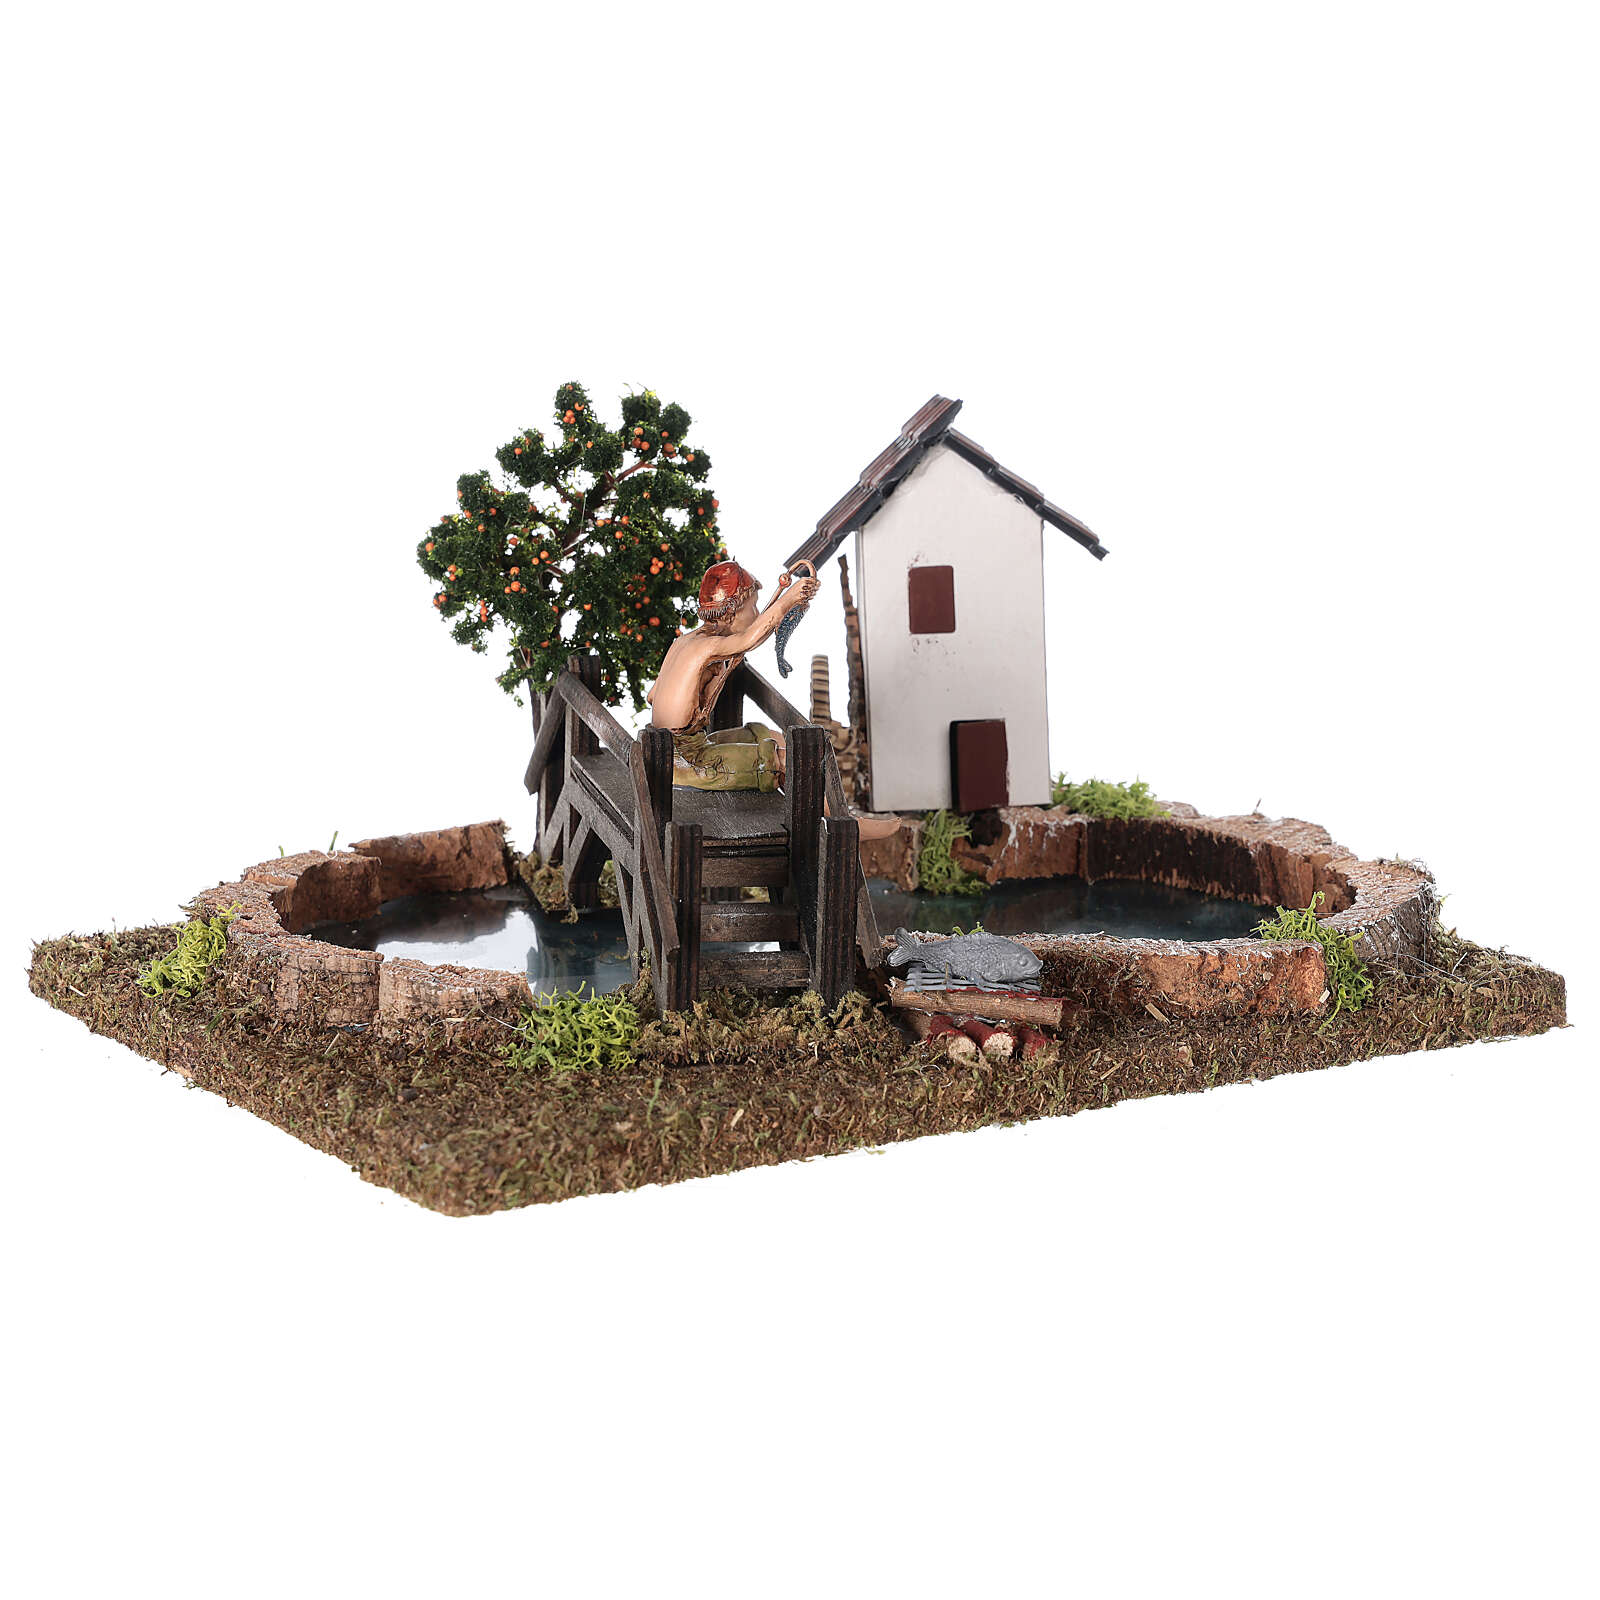 Modular river with houses and bridge 20x20x20 cm 4